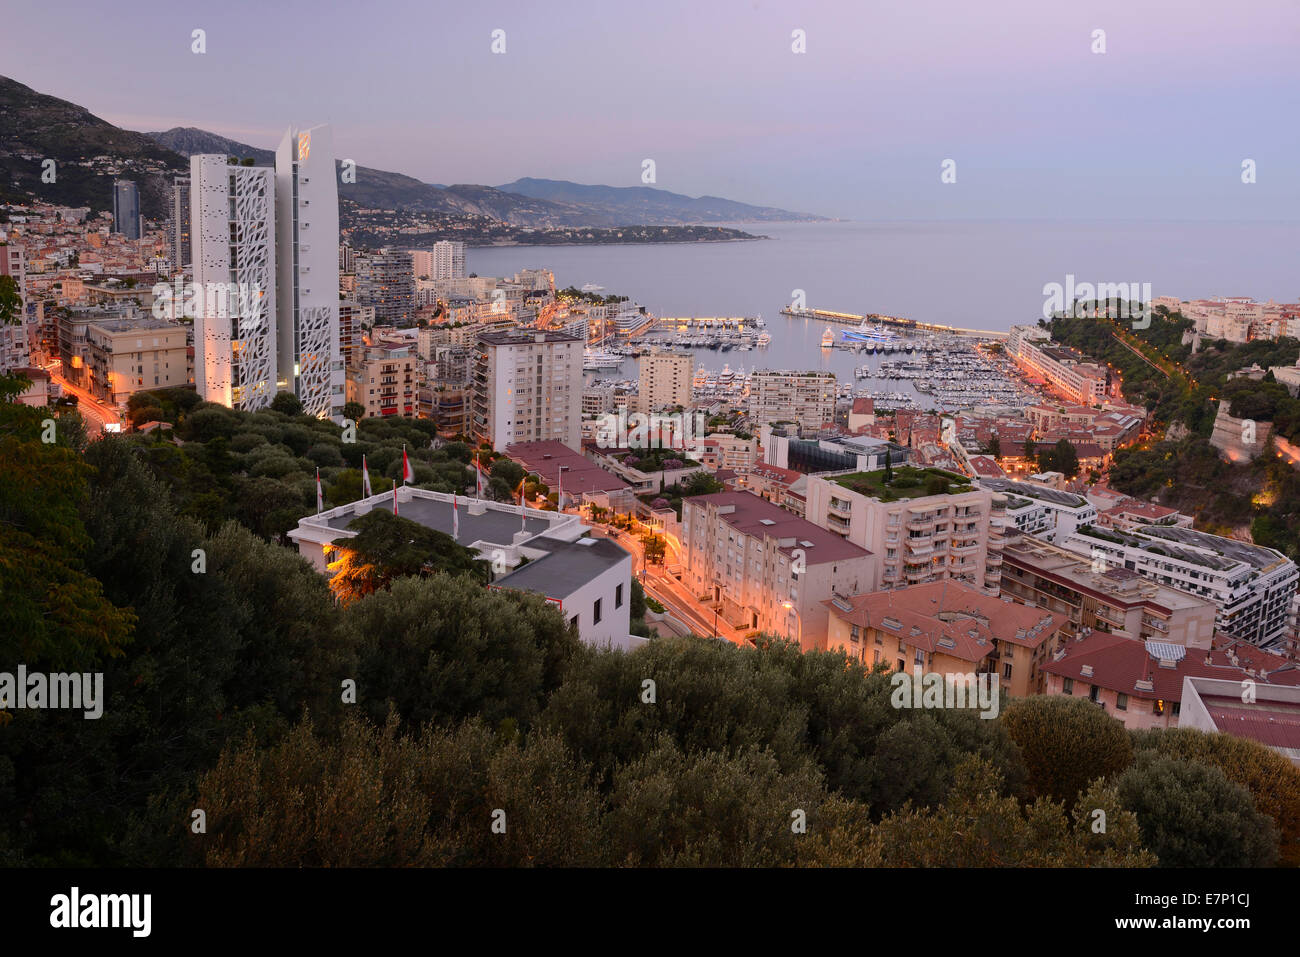 Europe, France, Monaco, Monte Carlo, French, Riviera, marina, luxury, Mediterranean, coast, city, tax haven, city - Stock Image